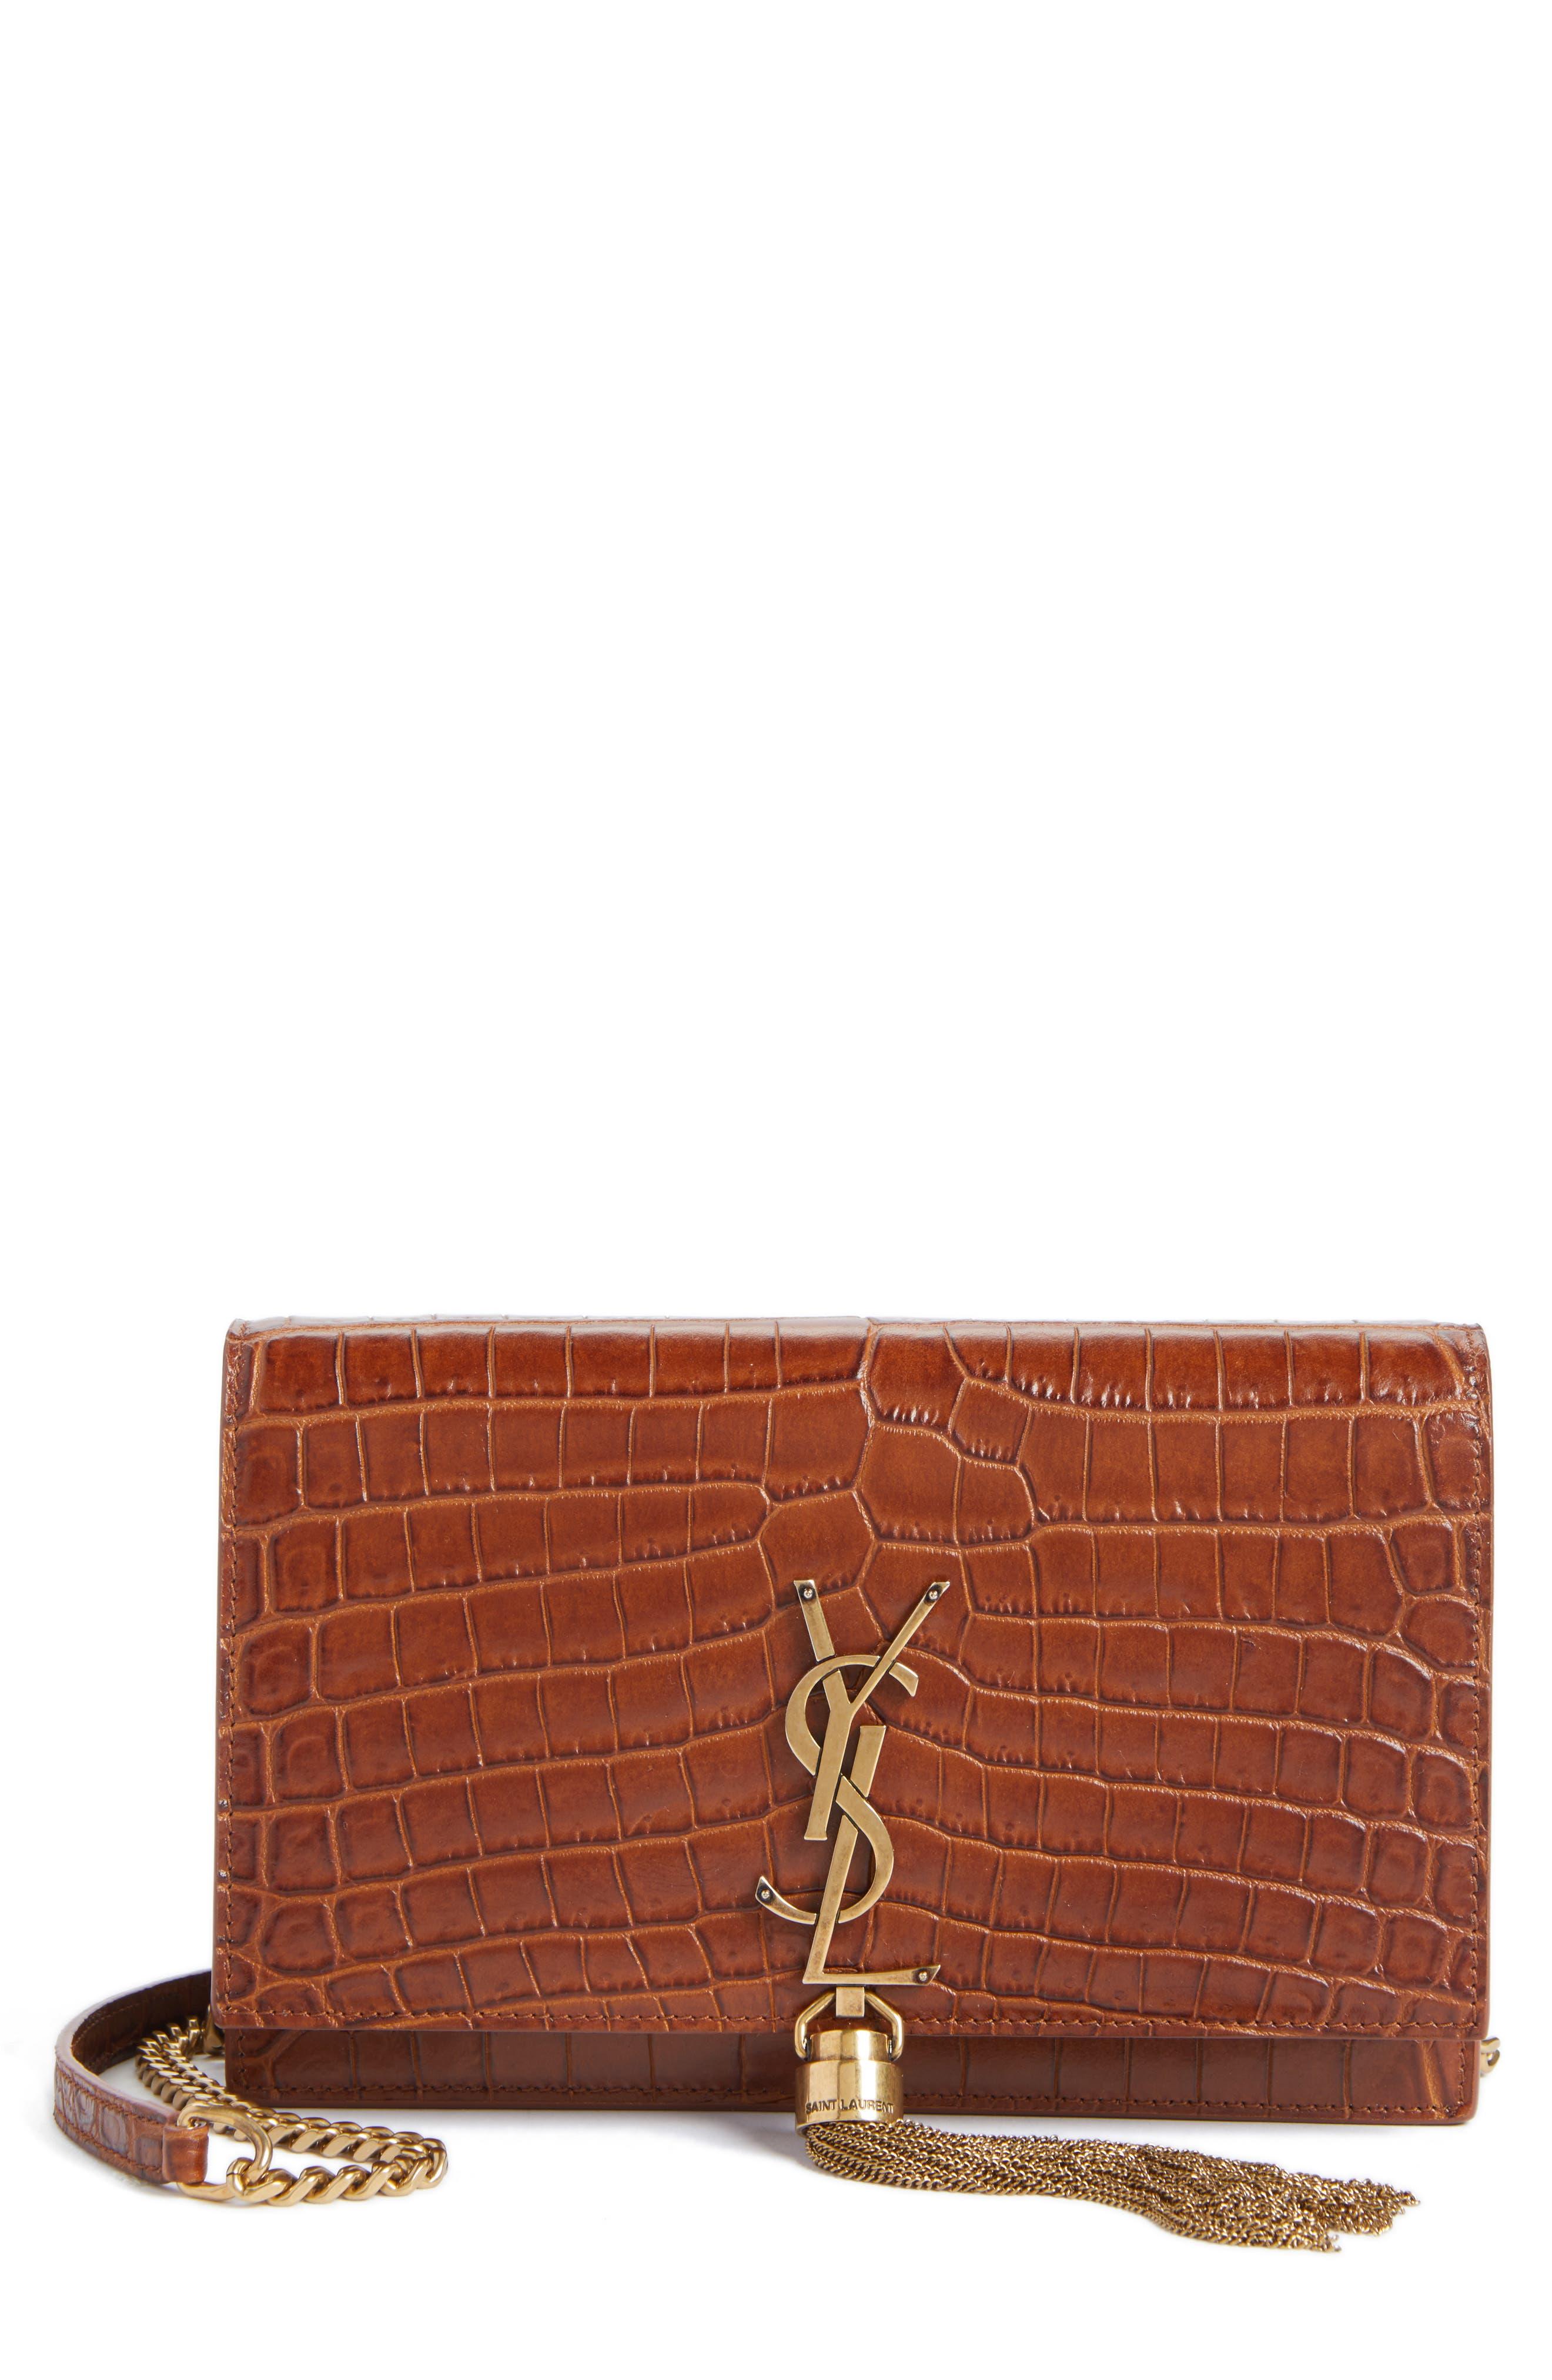 Saint Laurent Monogram Croc Embossed Calfskin Wallet on a Chain